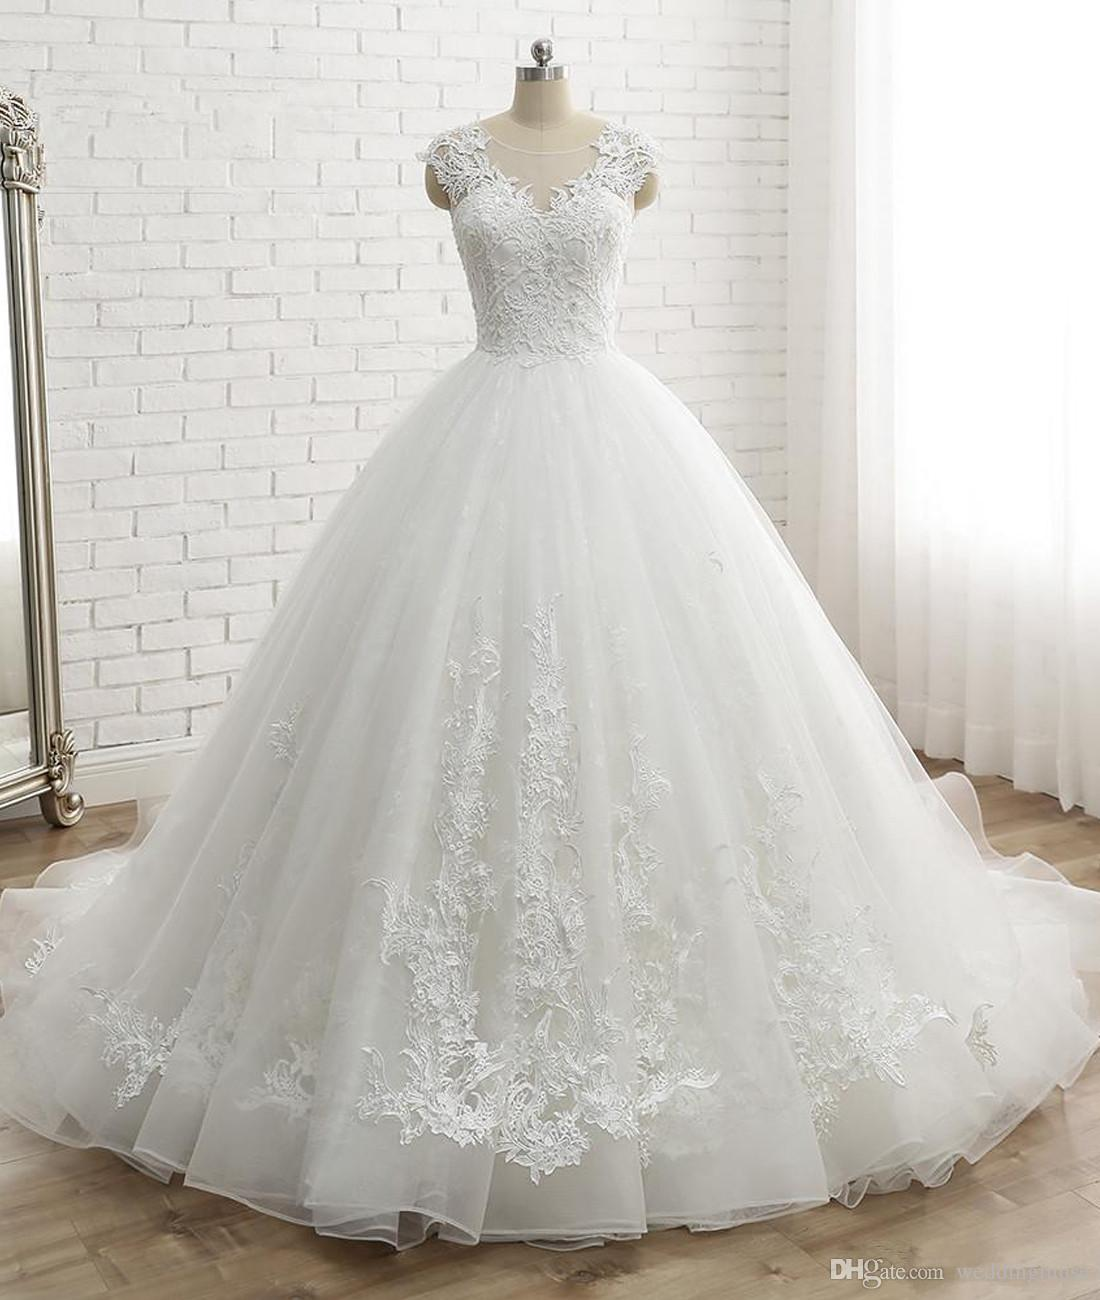 Women s Cap Sleeve Vintage Lace Bridal Dress Princess Ball Gown ... 2e5e75735912